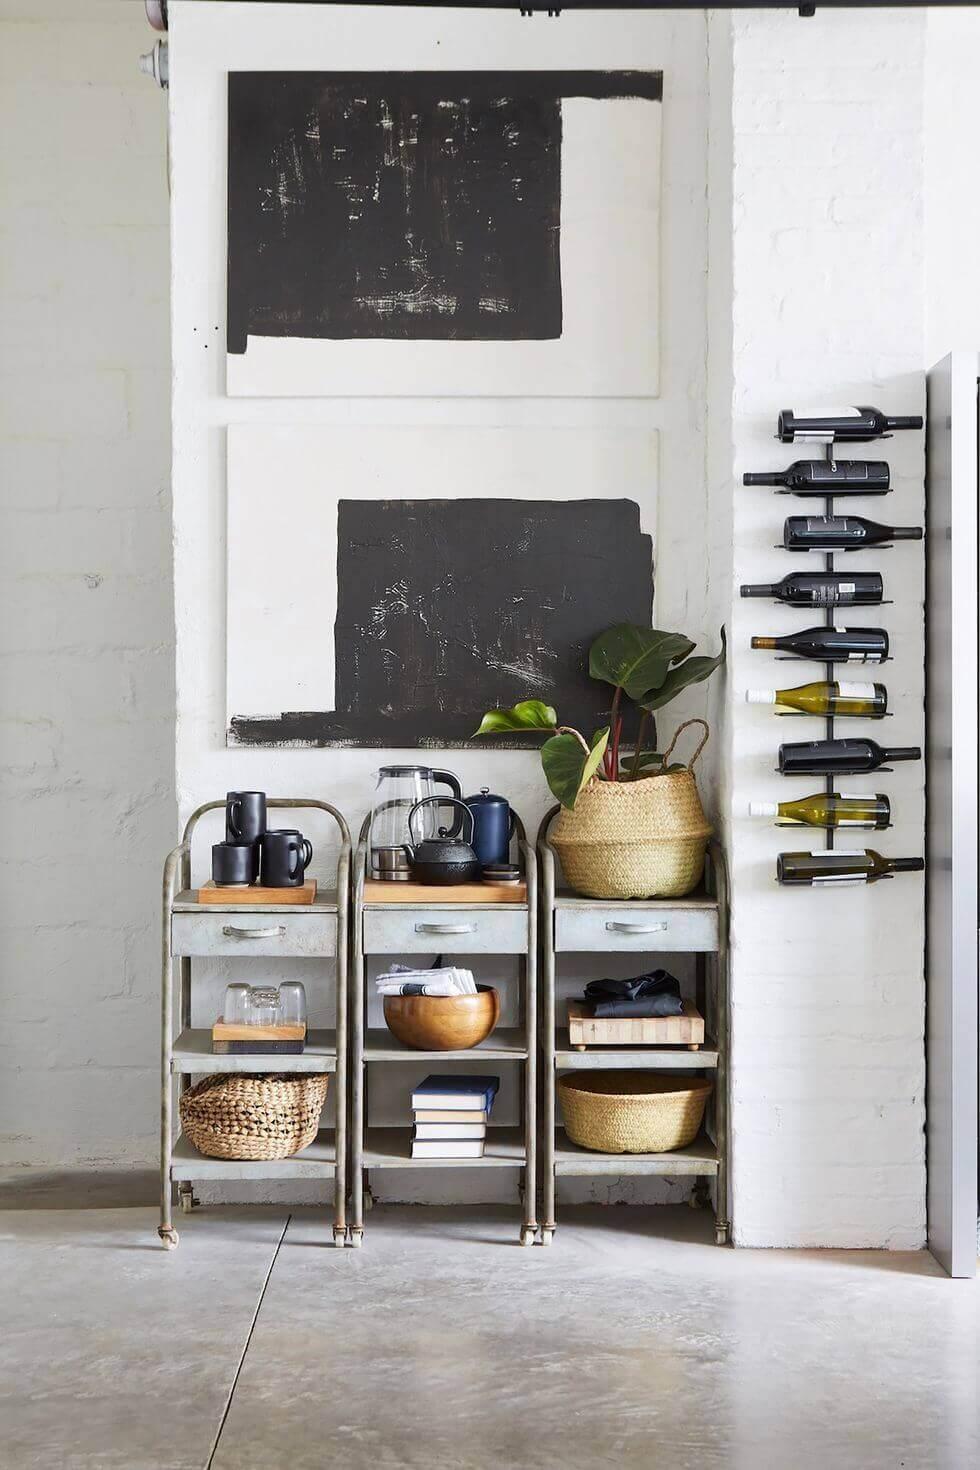 Small Indian Kitchen Storage Ideas Kmart Repurpose Old Office Supplies